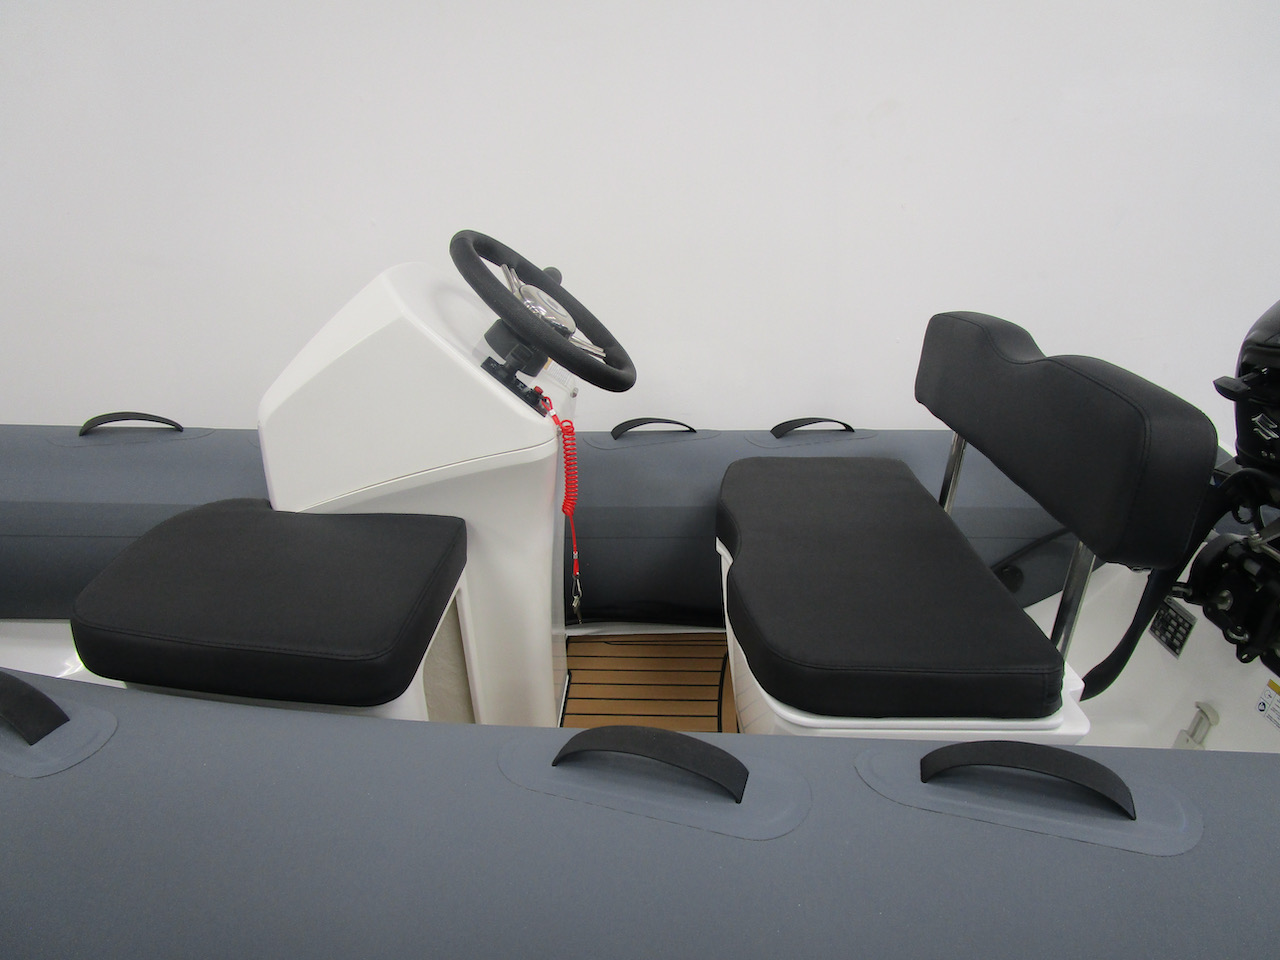 GRAND S300 RIB seating